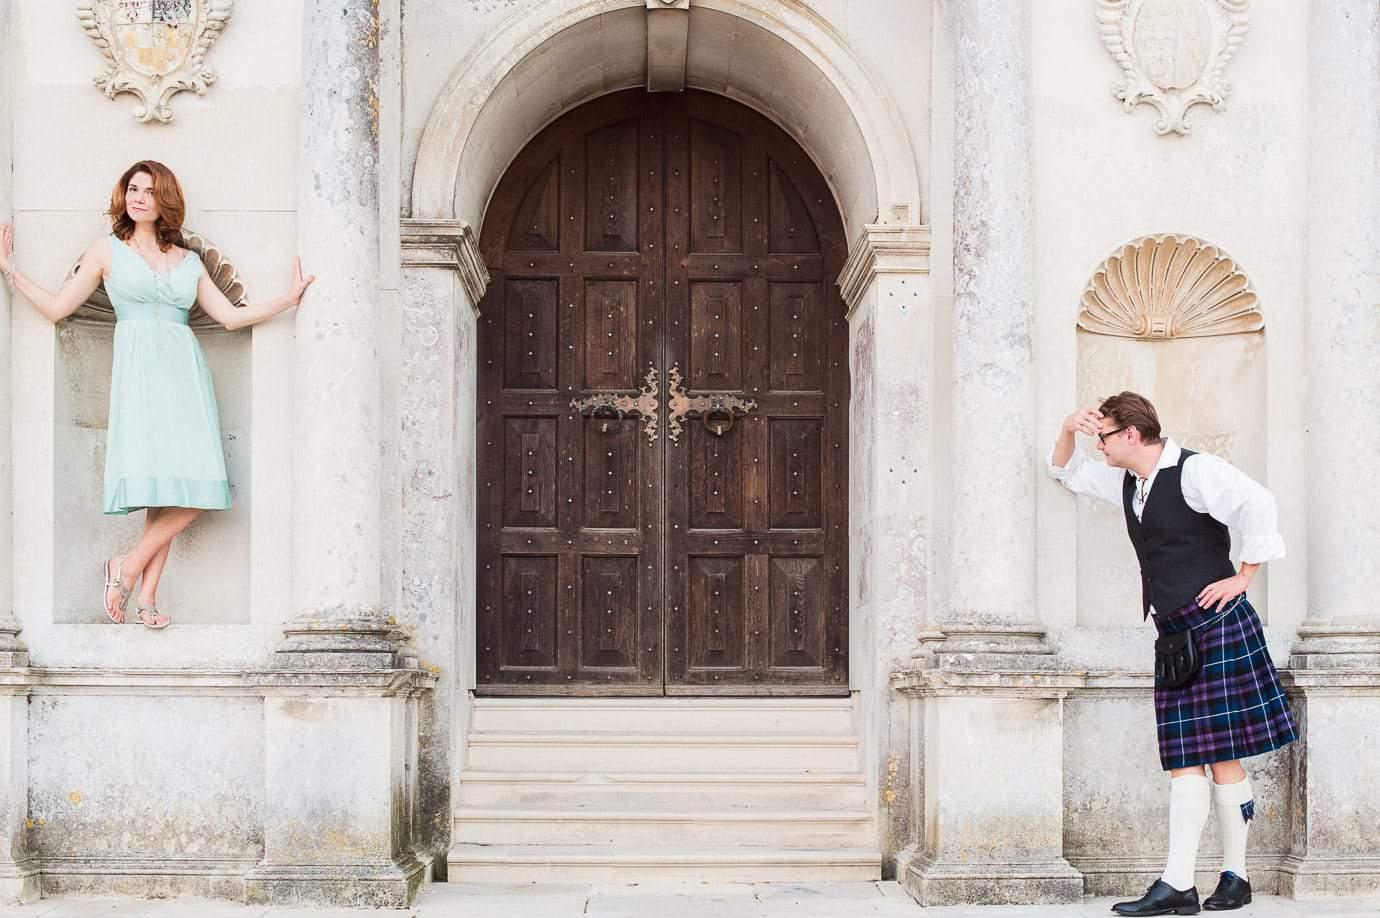 Fun wedding guests posing at Lulworth Castle wedding venue grand wooden doors